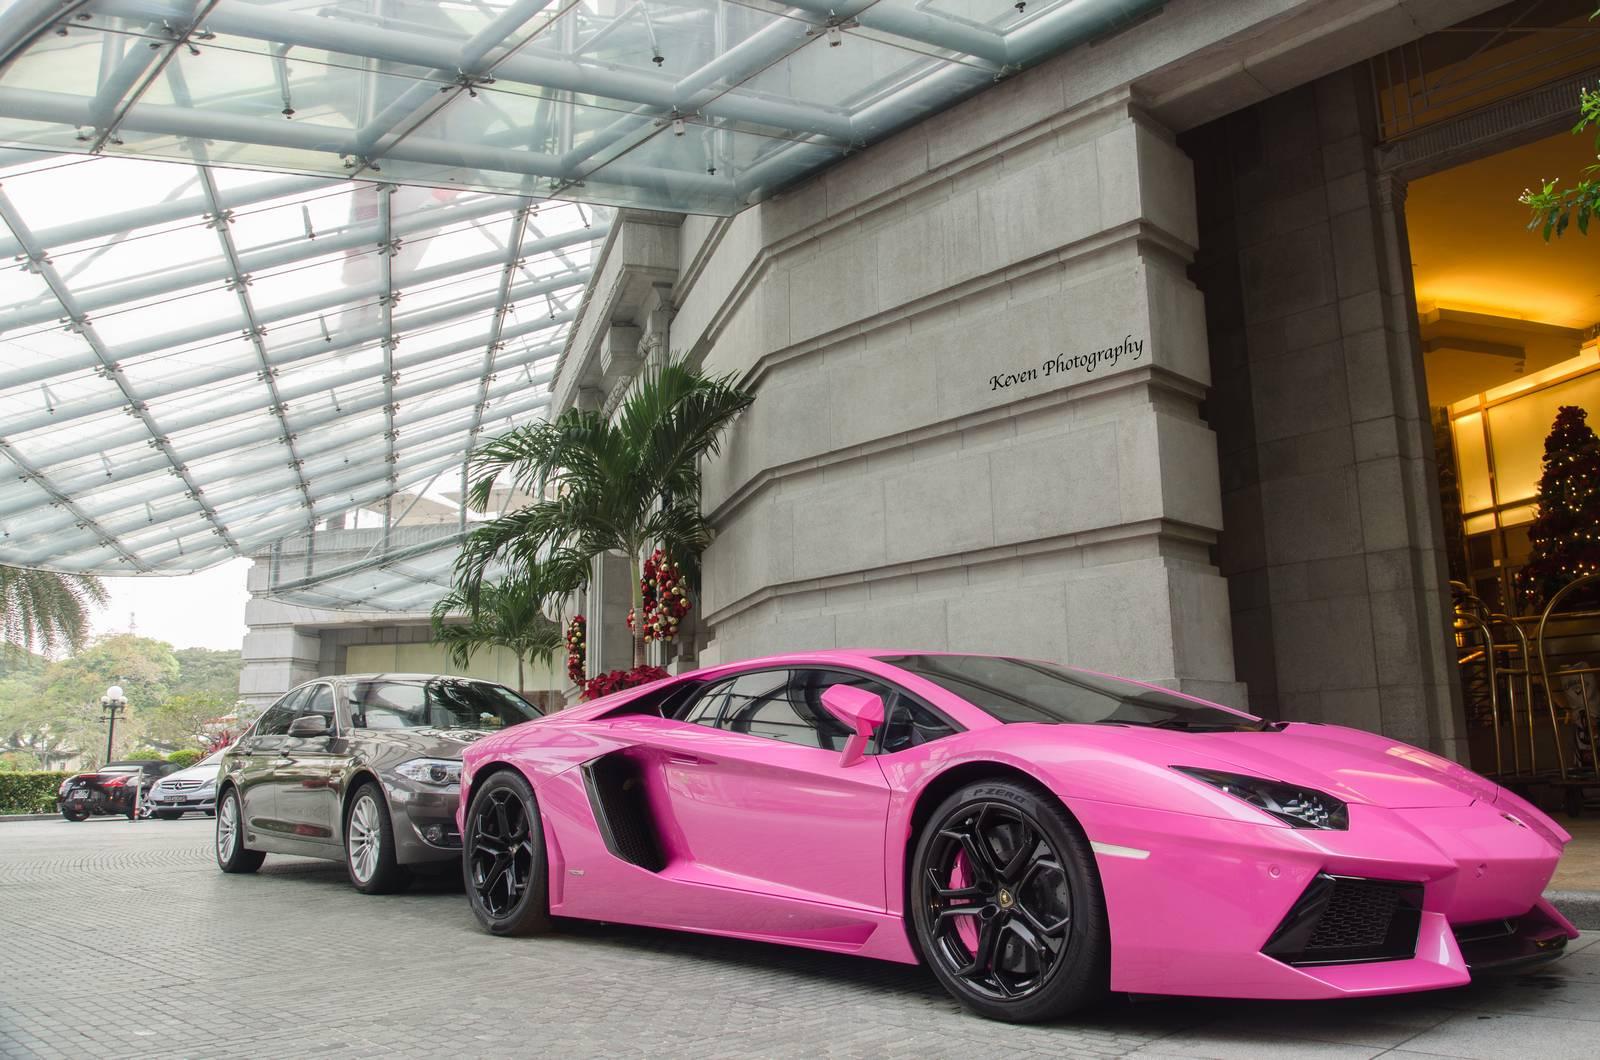 Lạ mắt với Lamborghini Aventador màu hồng